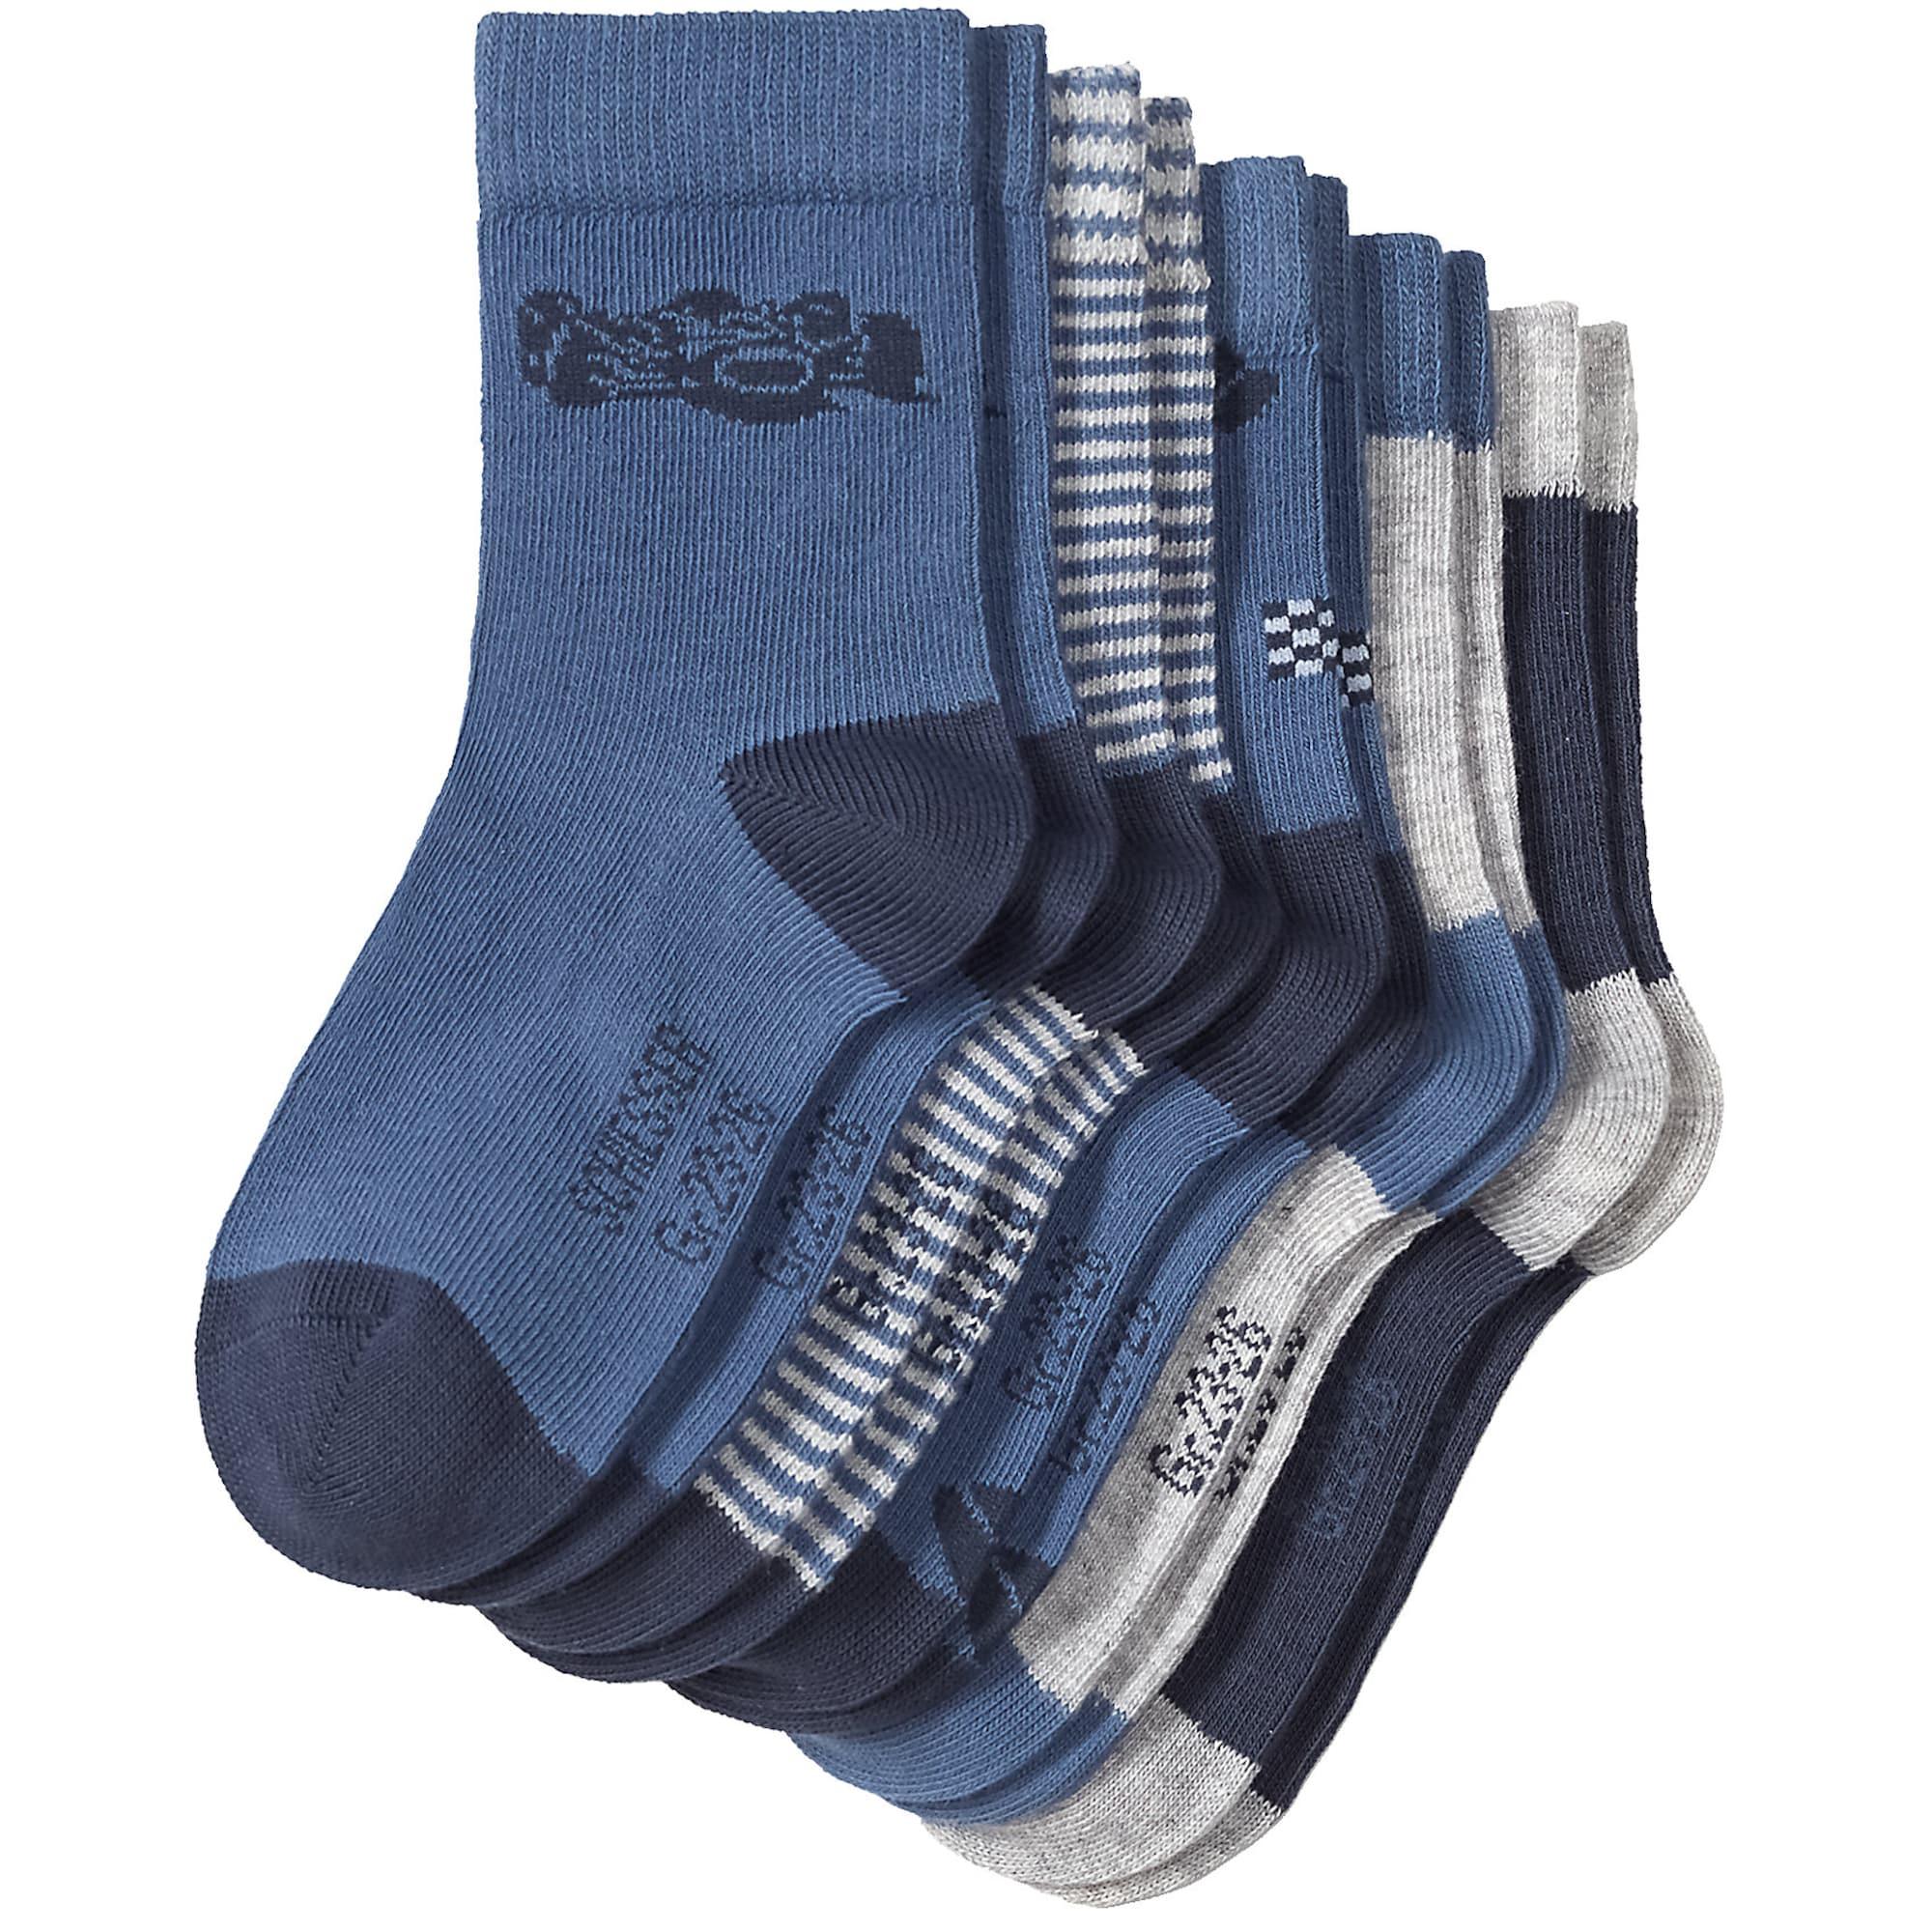 Ponožky chladná modrá světle šedá bílá SCHIESSER